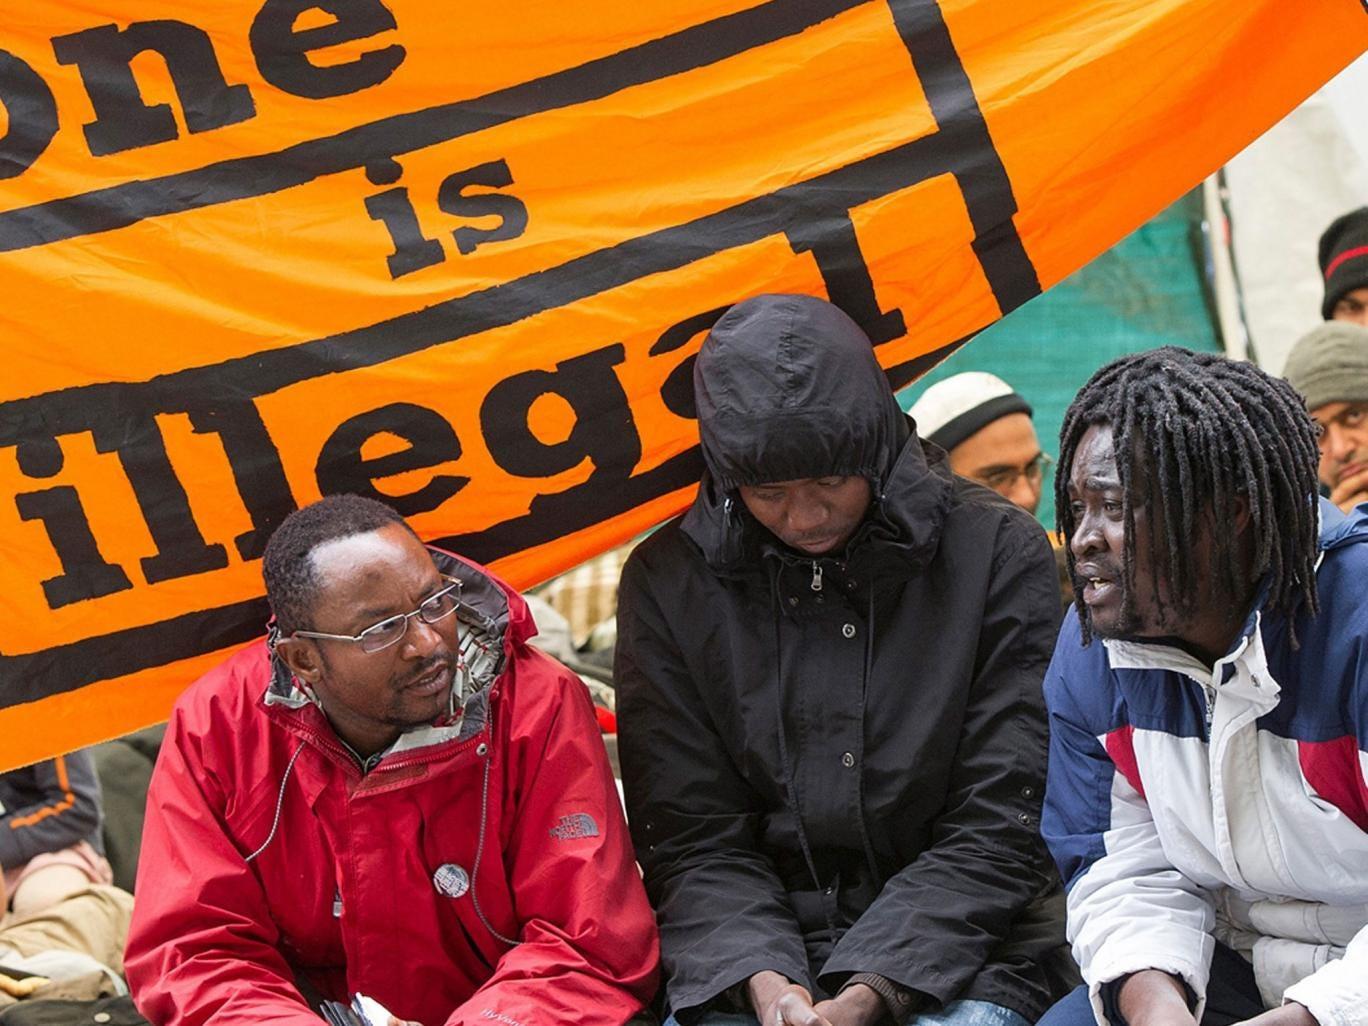 Asylum seekers sit in an outdoor camp in Munich